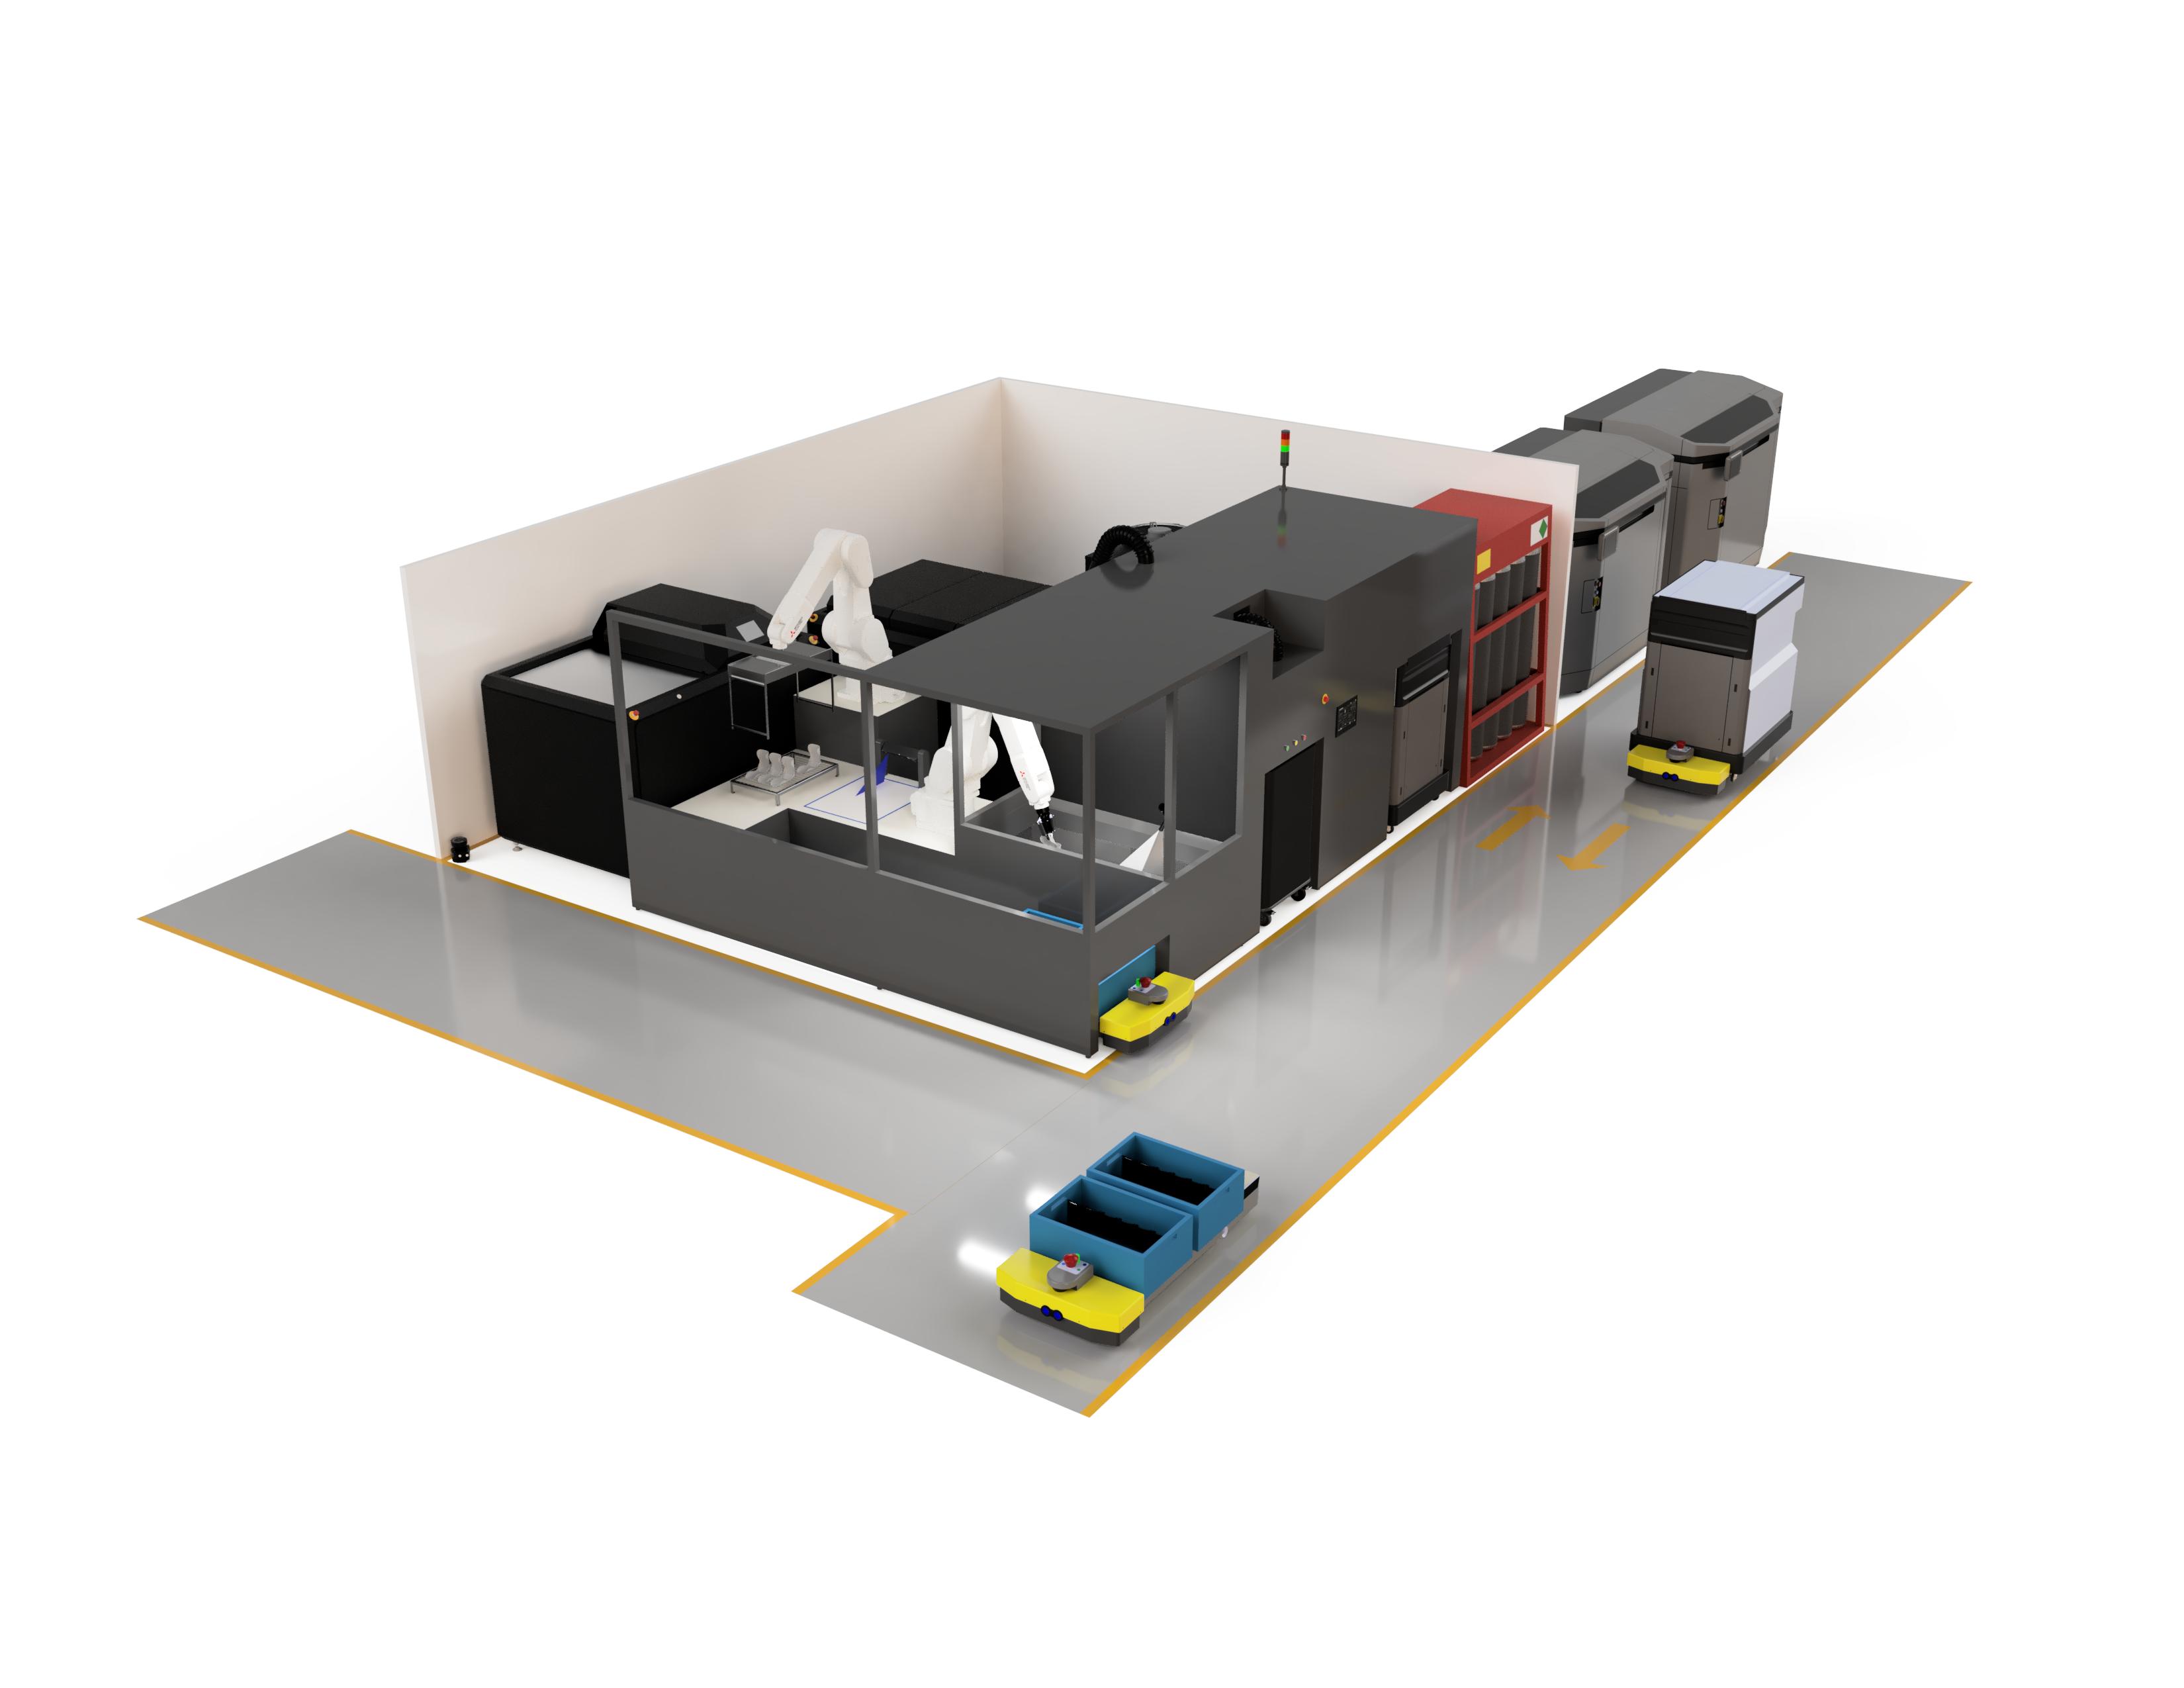 AMT's Digital Manufacturing System assembly. Image via AMT.